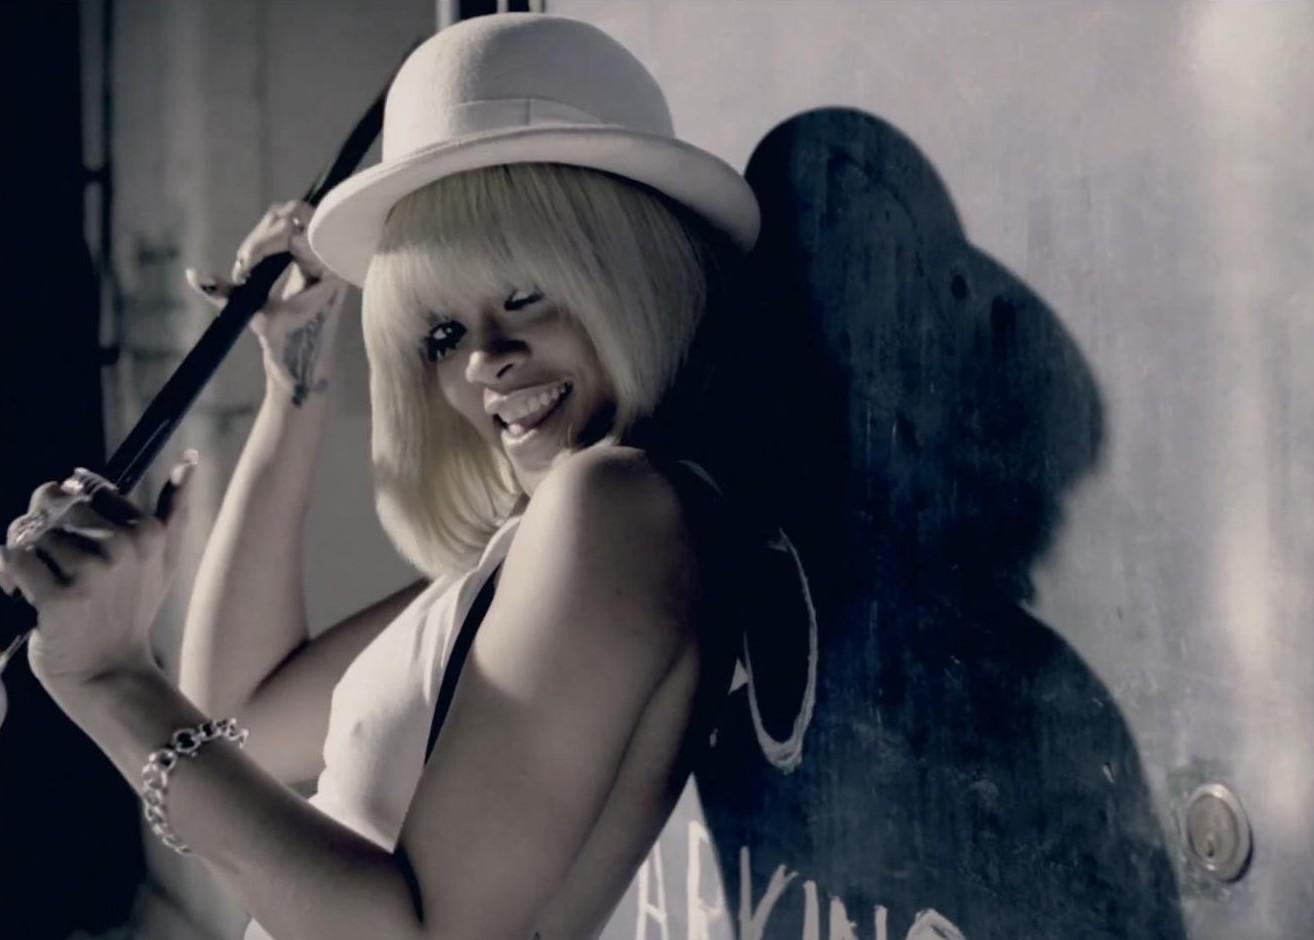 http://2.bp.blogspot.com/-j_pRVi7RMdM/TvT79Nq9EkI/AAAAAAAAPRw/HLjXent02vM/s1600/Rihanna-e1324634399718.jpg